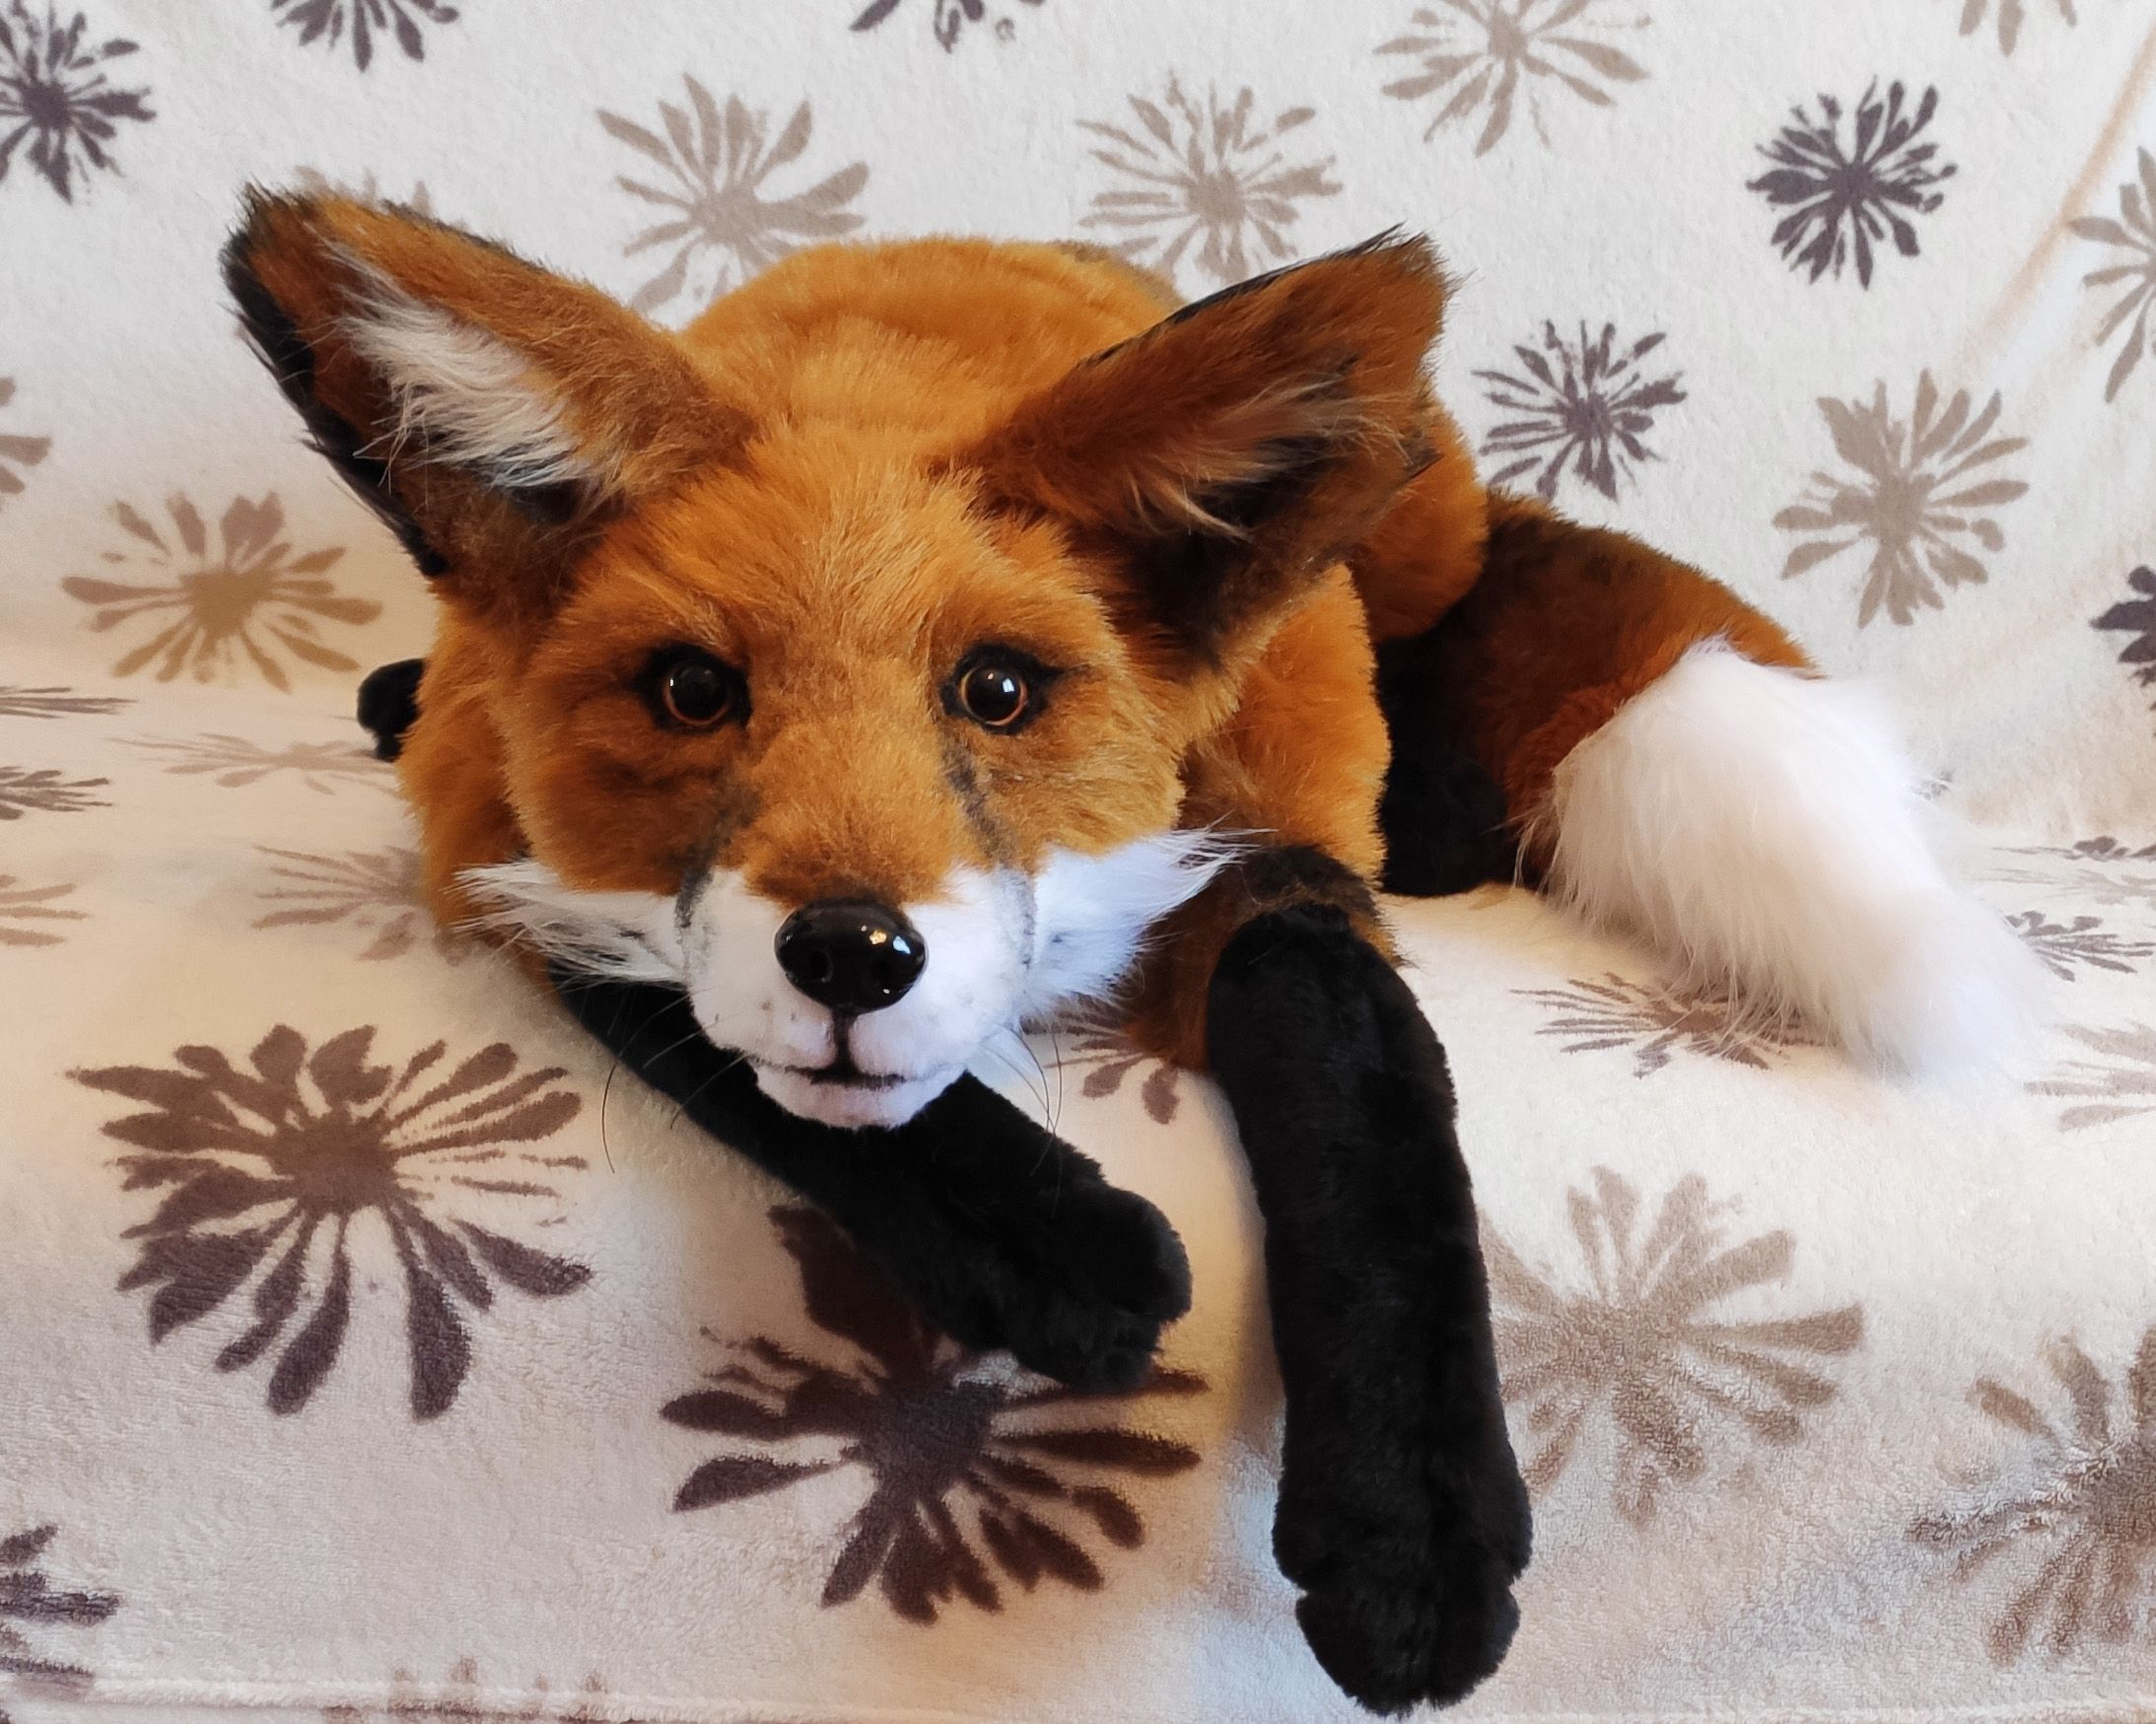 Made To Order For July 2021 Big Size Life Size And Realistic Lying Fox Plush Toy Fox Art Doll Stuffed Animal Red White Fox Custom Fox Plush Toy Fox Plush Plush Dog Toys [ 1749 x 2187 Pixel ]